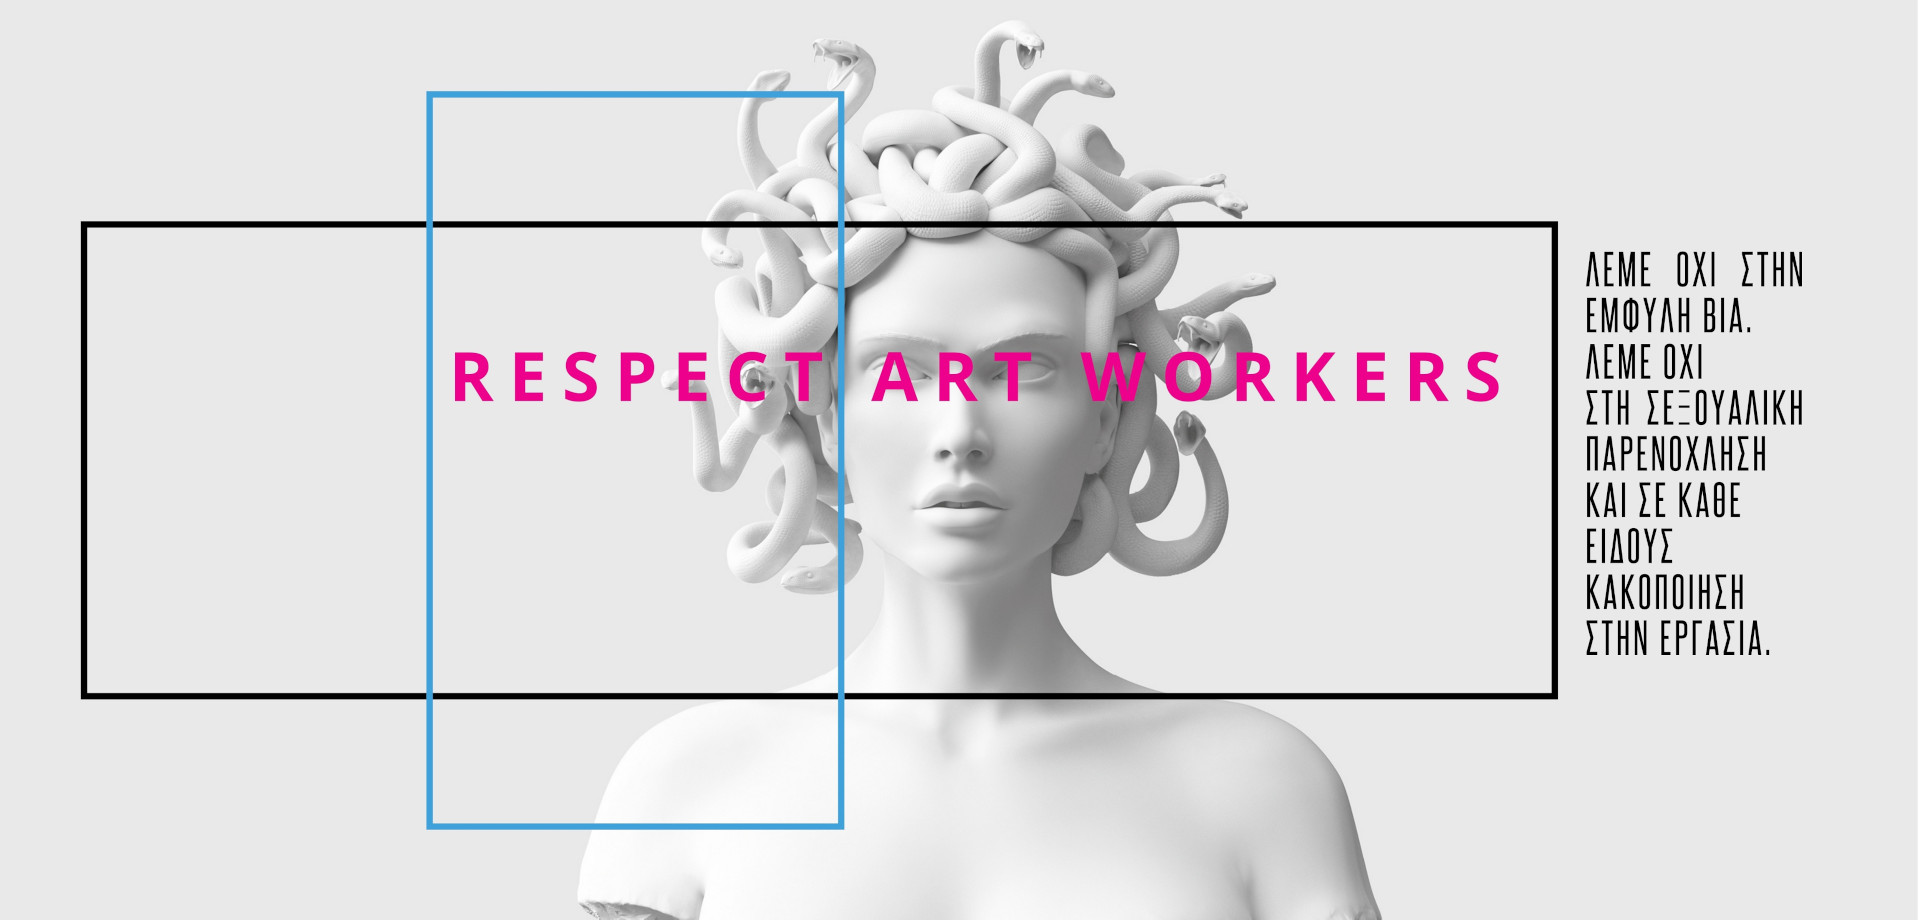 RESPECT ART WORKERS